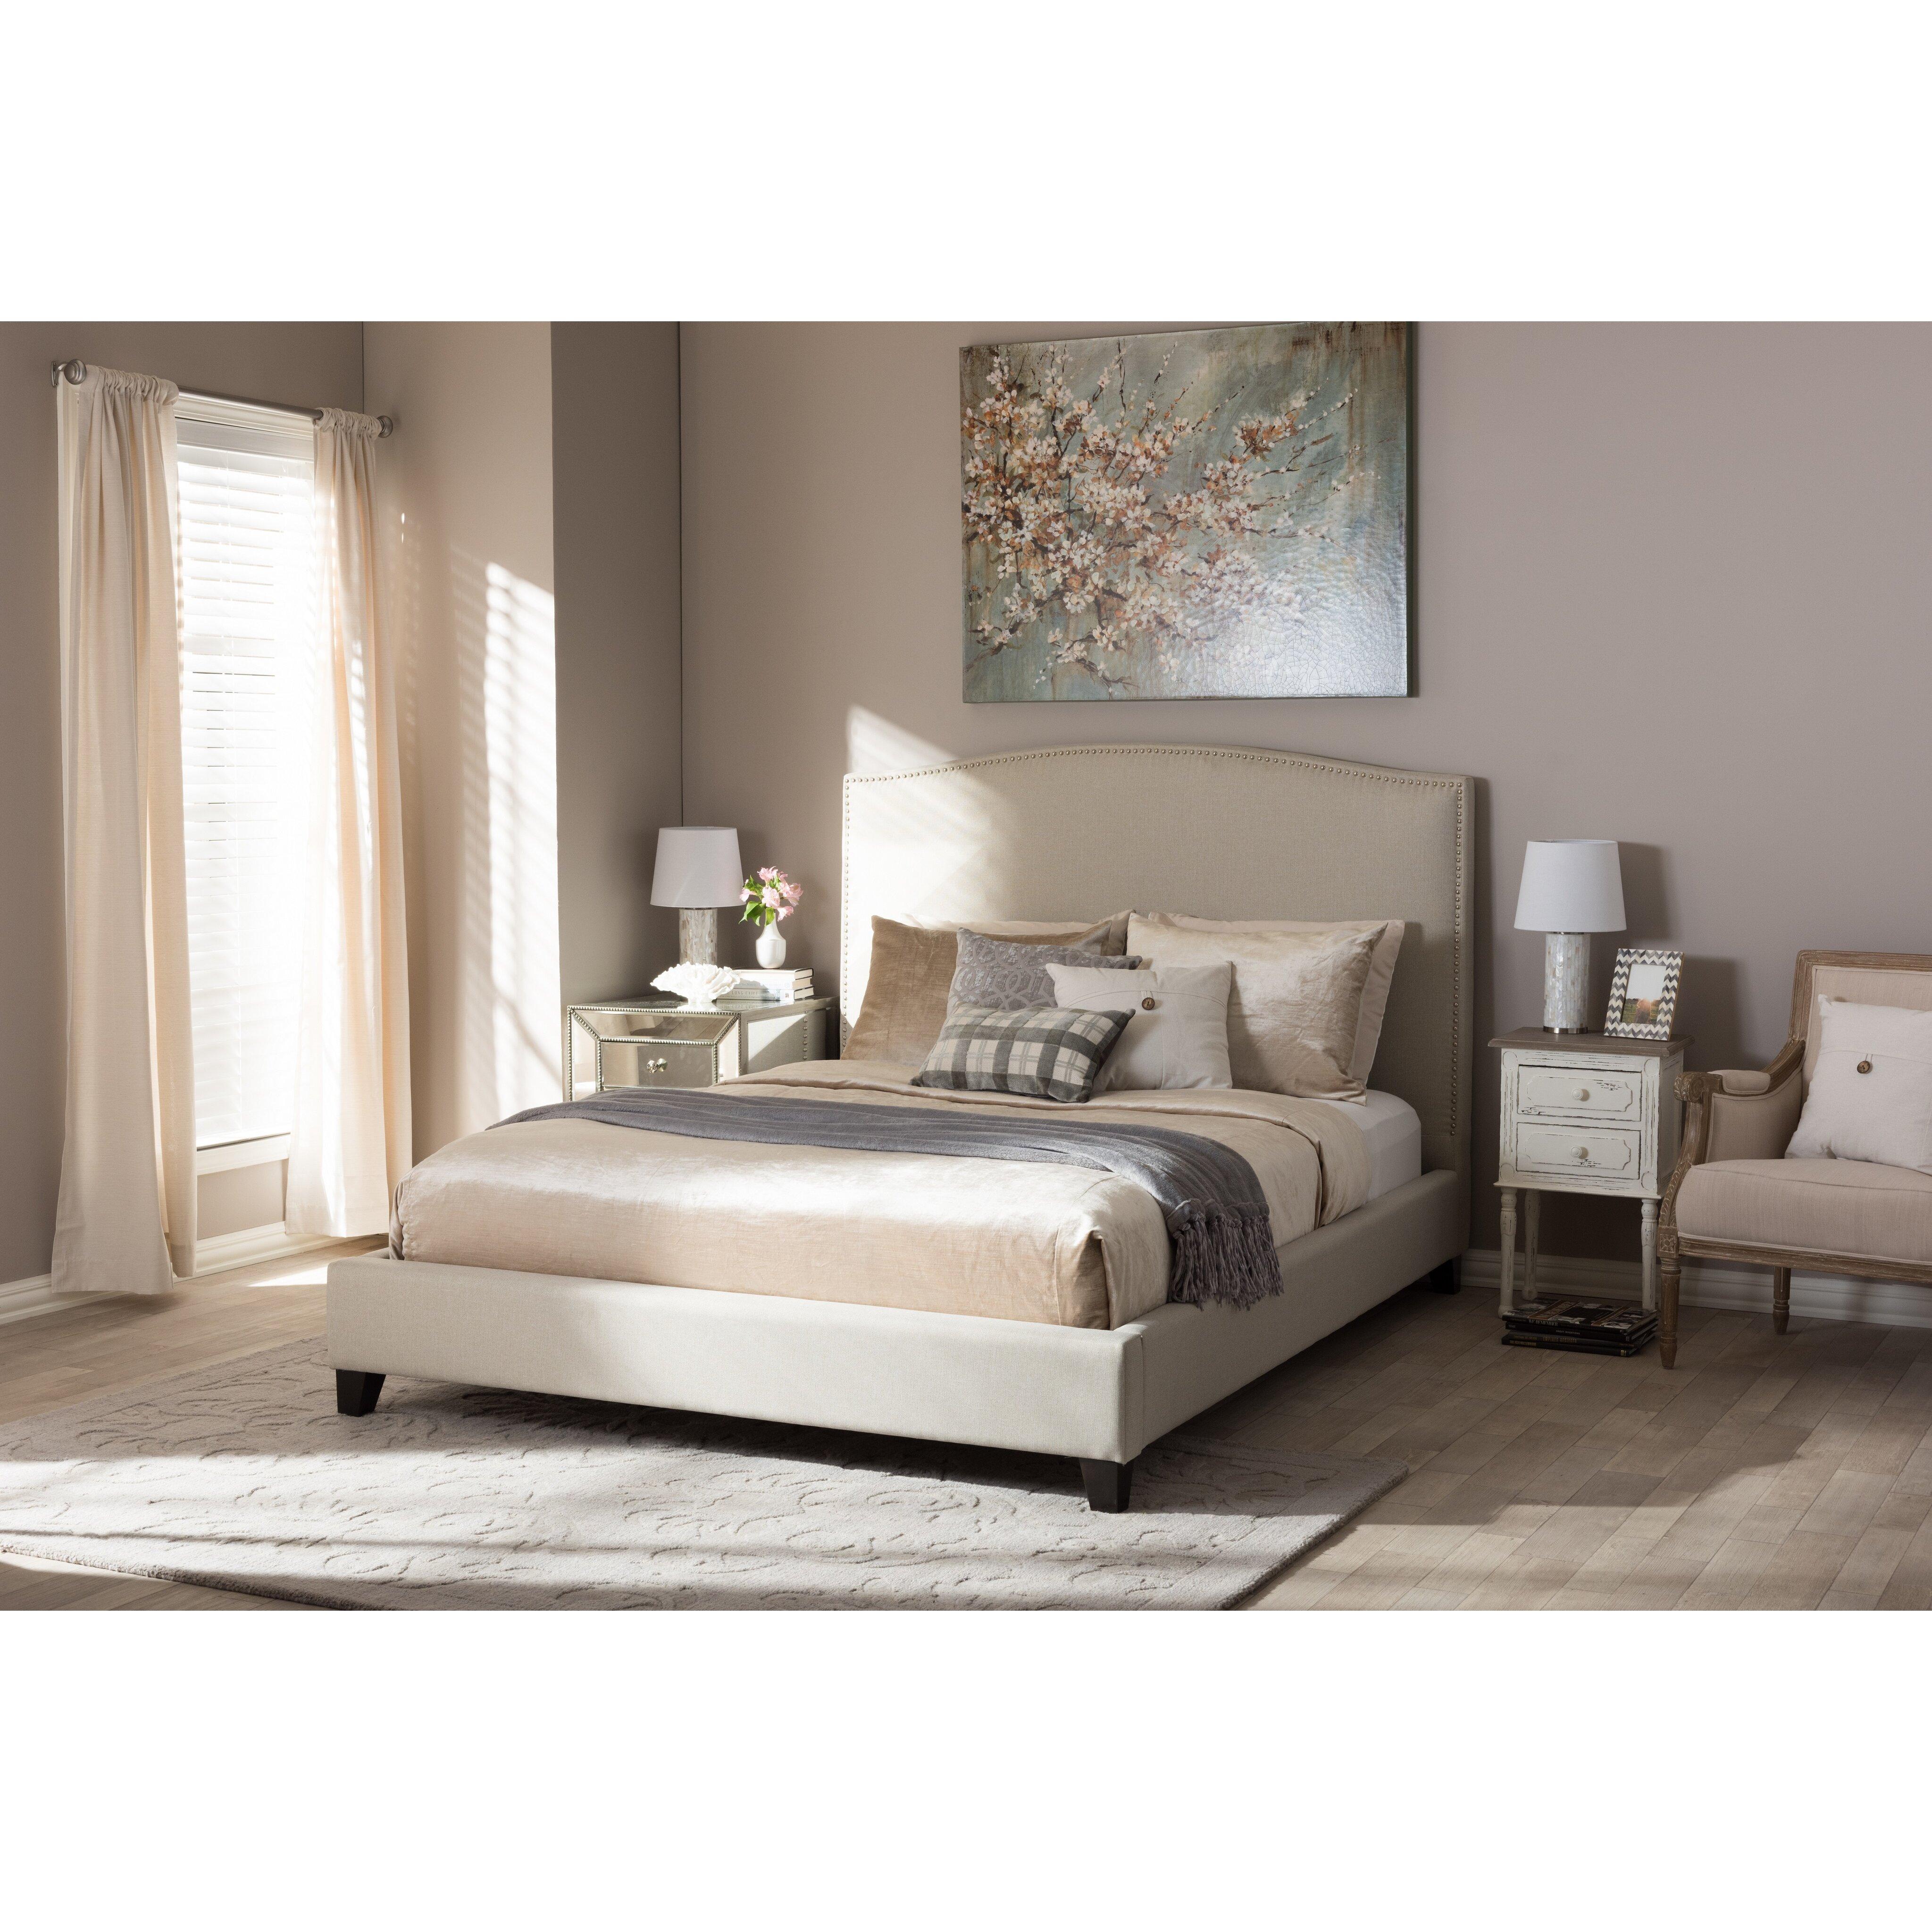 wholesale interiors baxton studio upholstered platform bed reviews wayfair